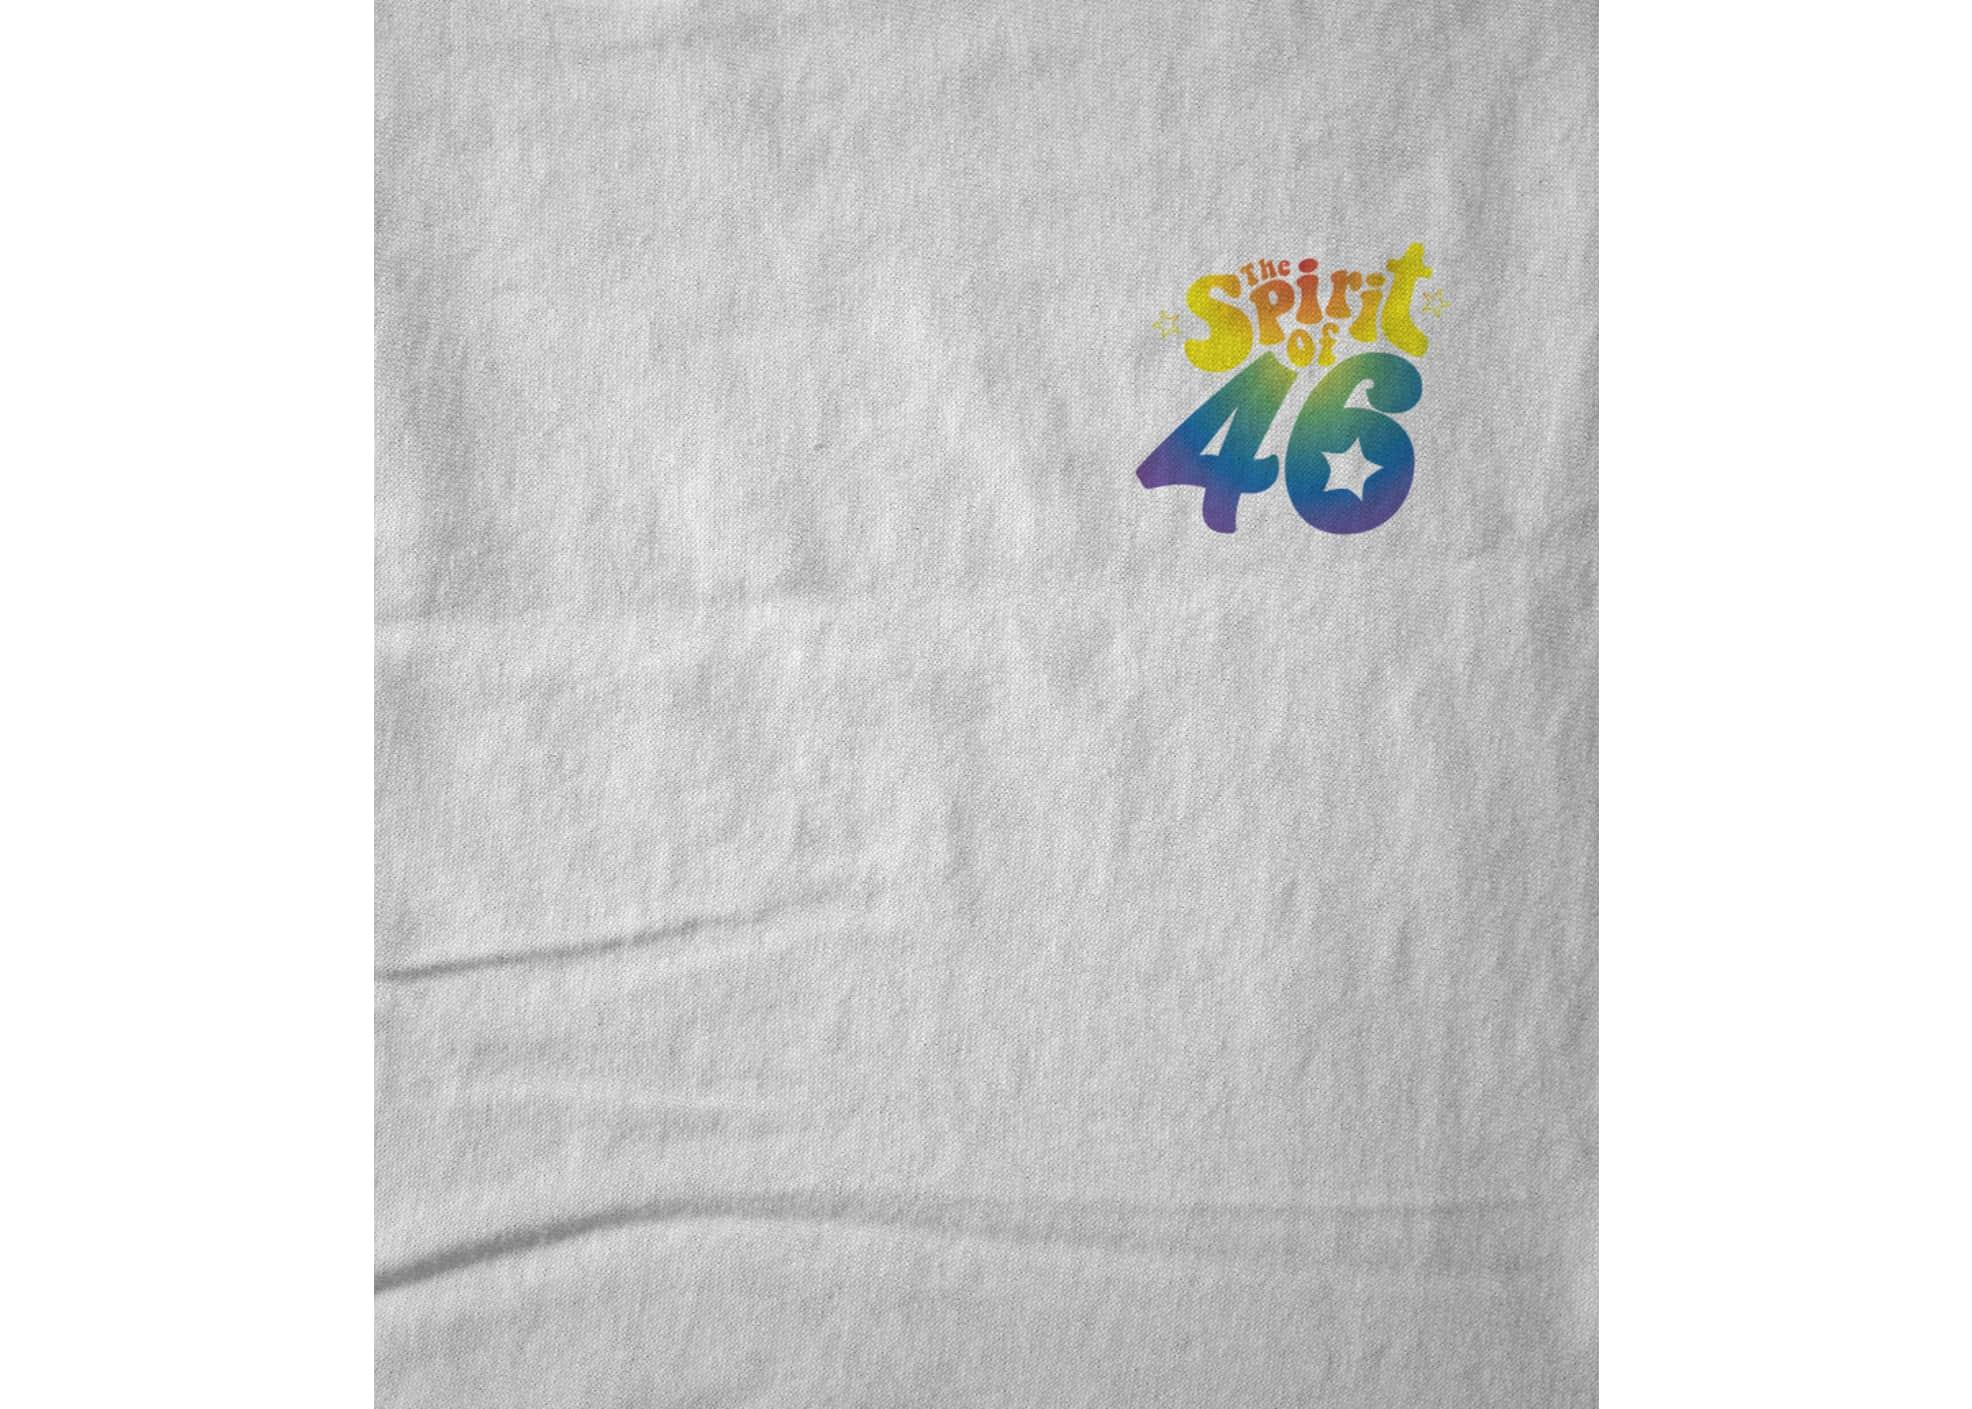 Airjoshb the spirit of 46   rainbow edition 1604877320